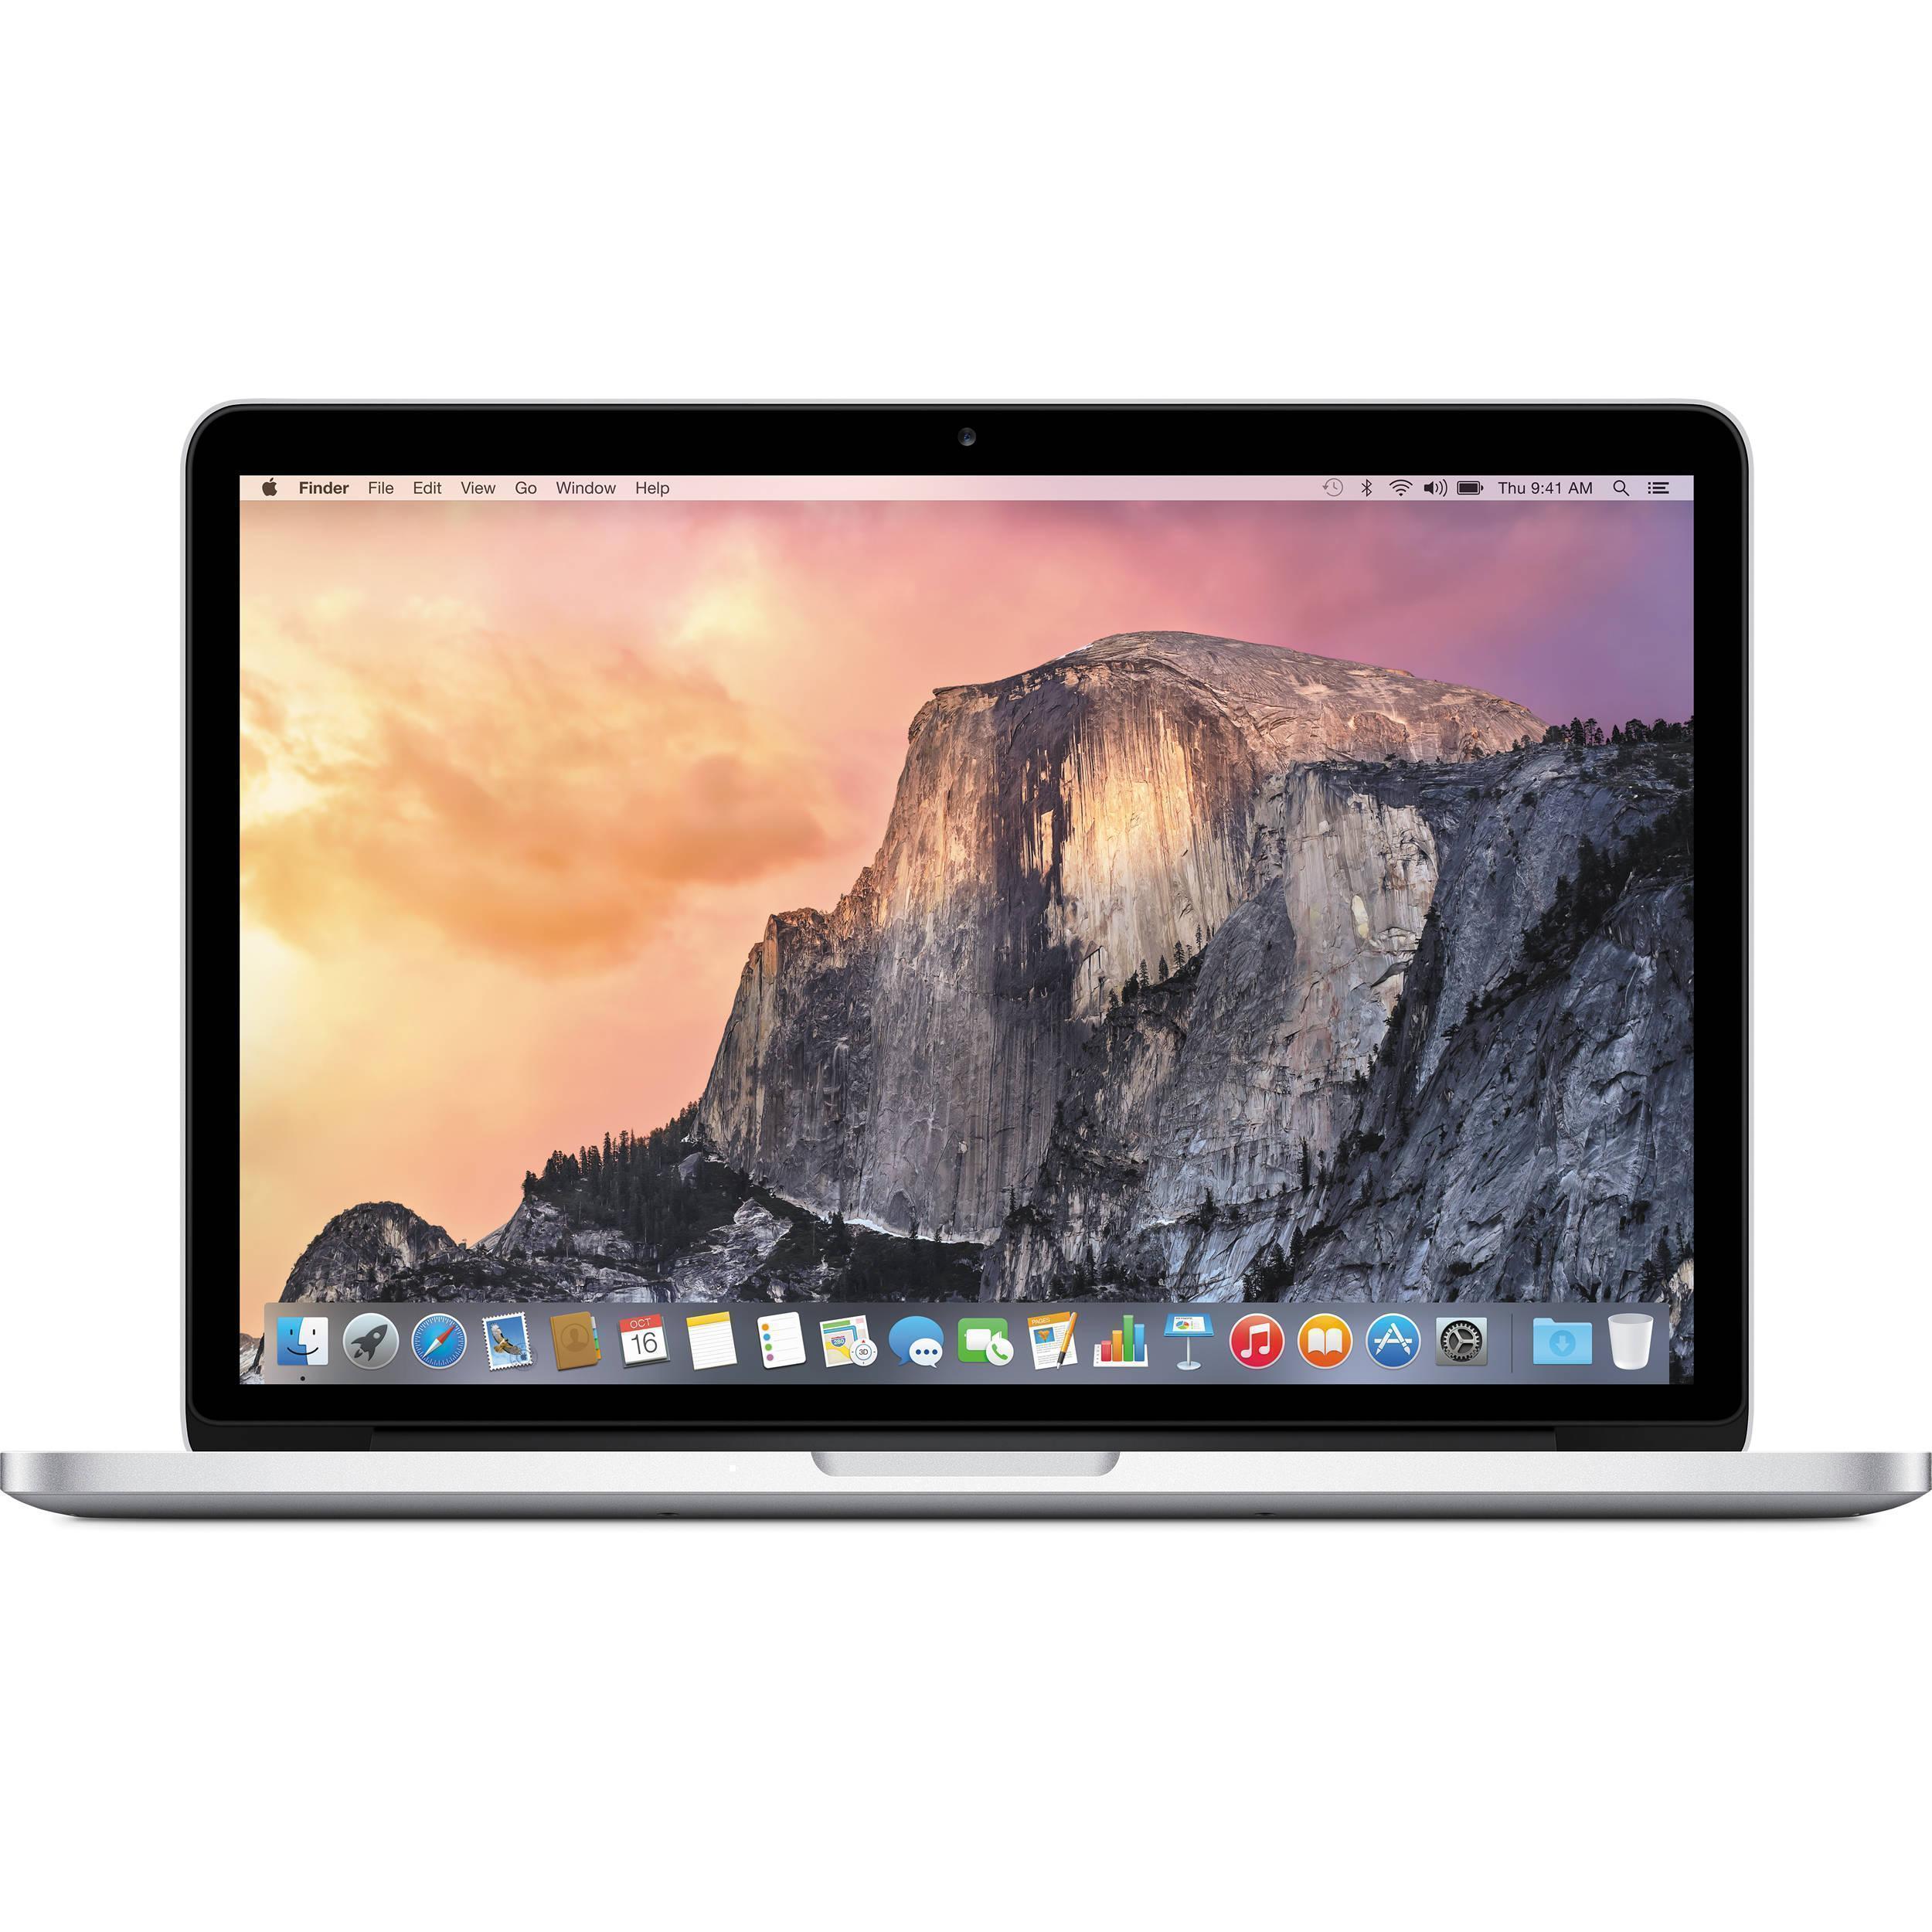 MacBook Pro Retina 13.3-inch (2013) - Core i5 - 4GB - SSD 128 GB QWERTY - Spanish